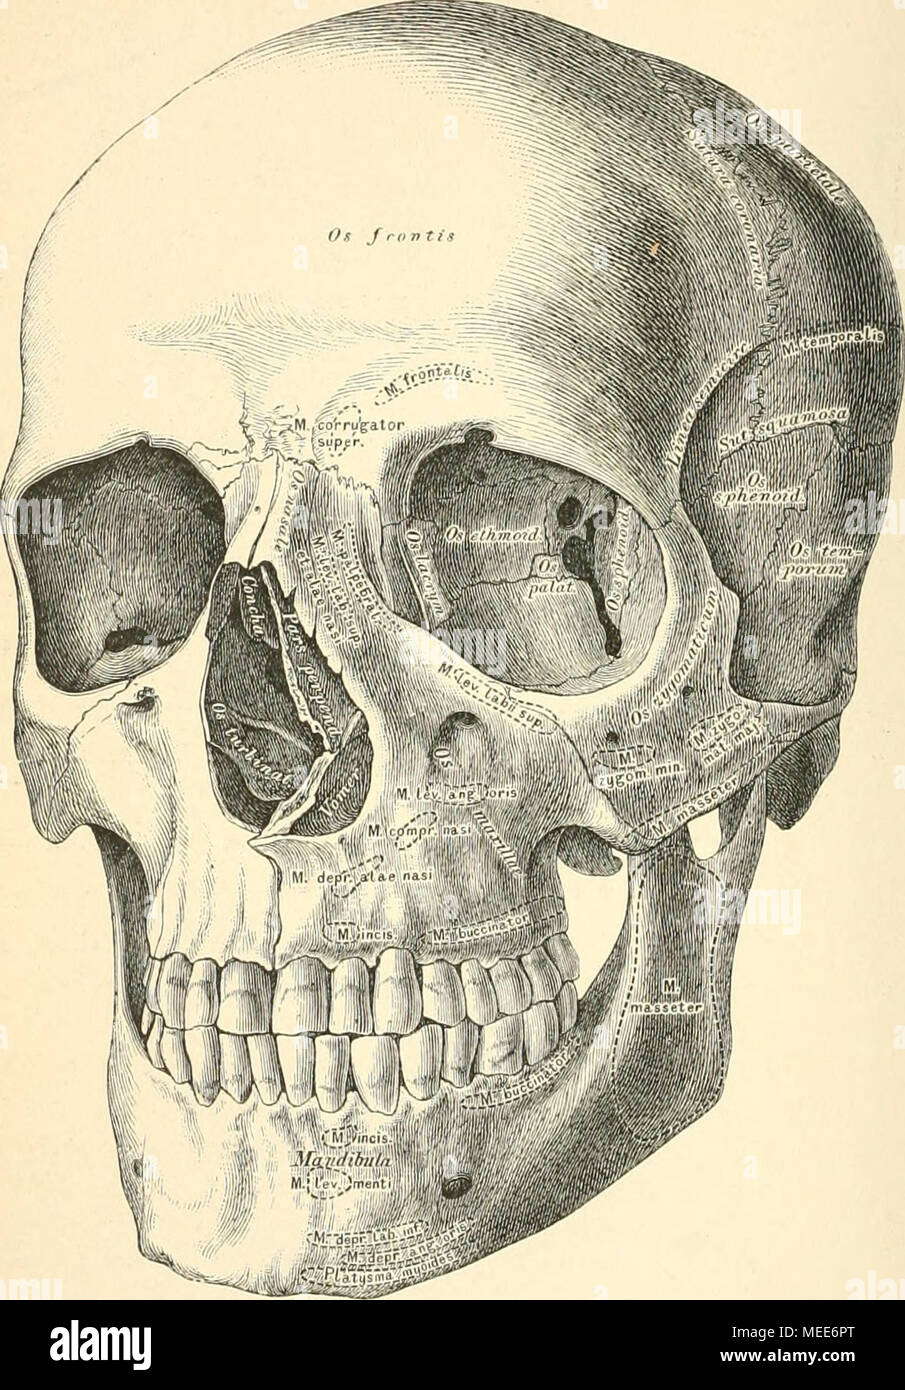 Schön Kopf Anatomie Fotos - Anatomie Ideen - finotti.info